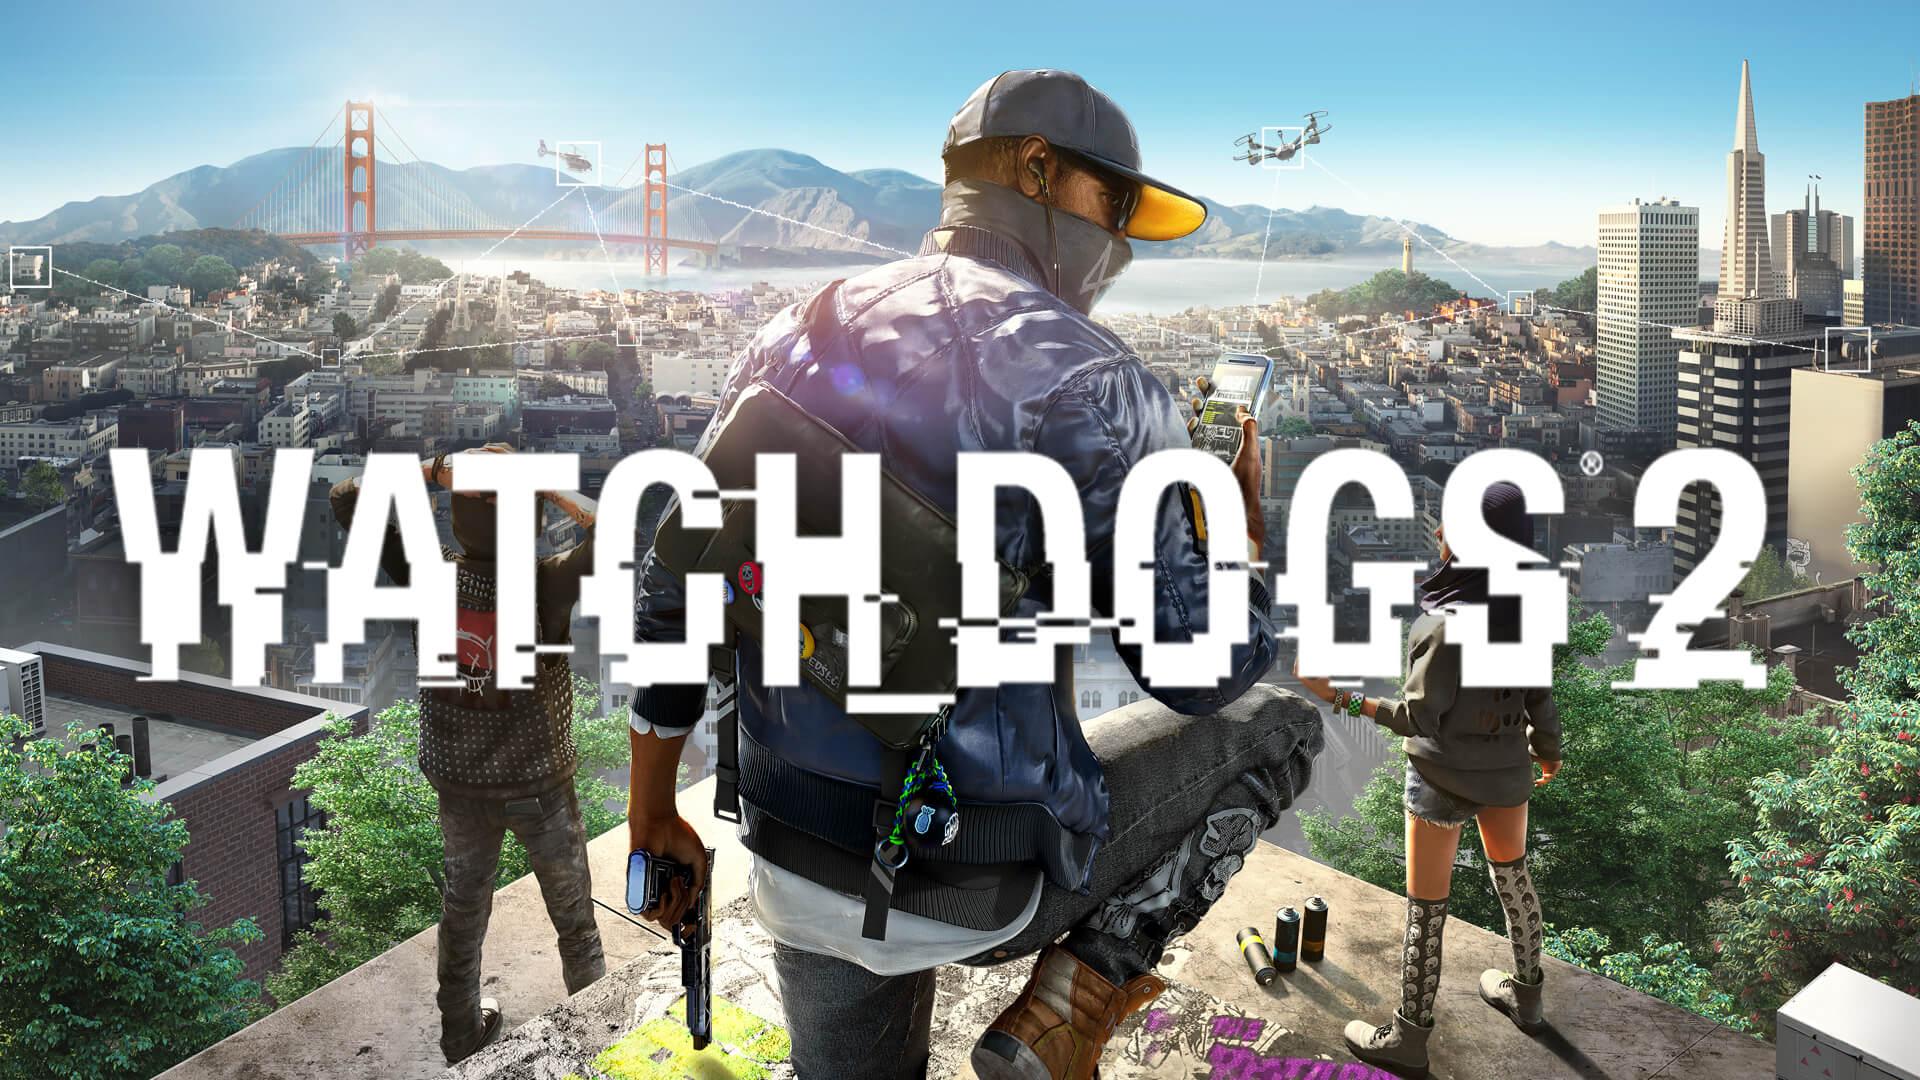 watch dog2